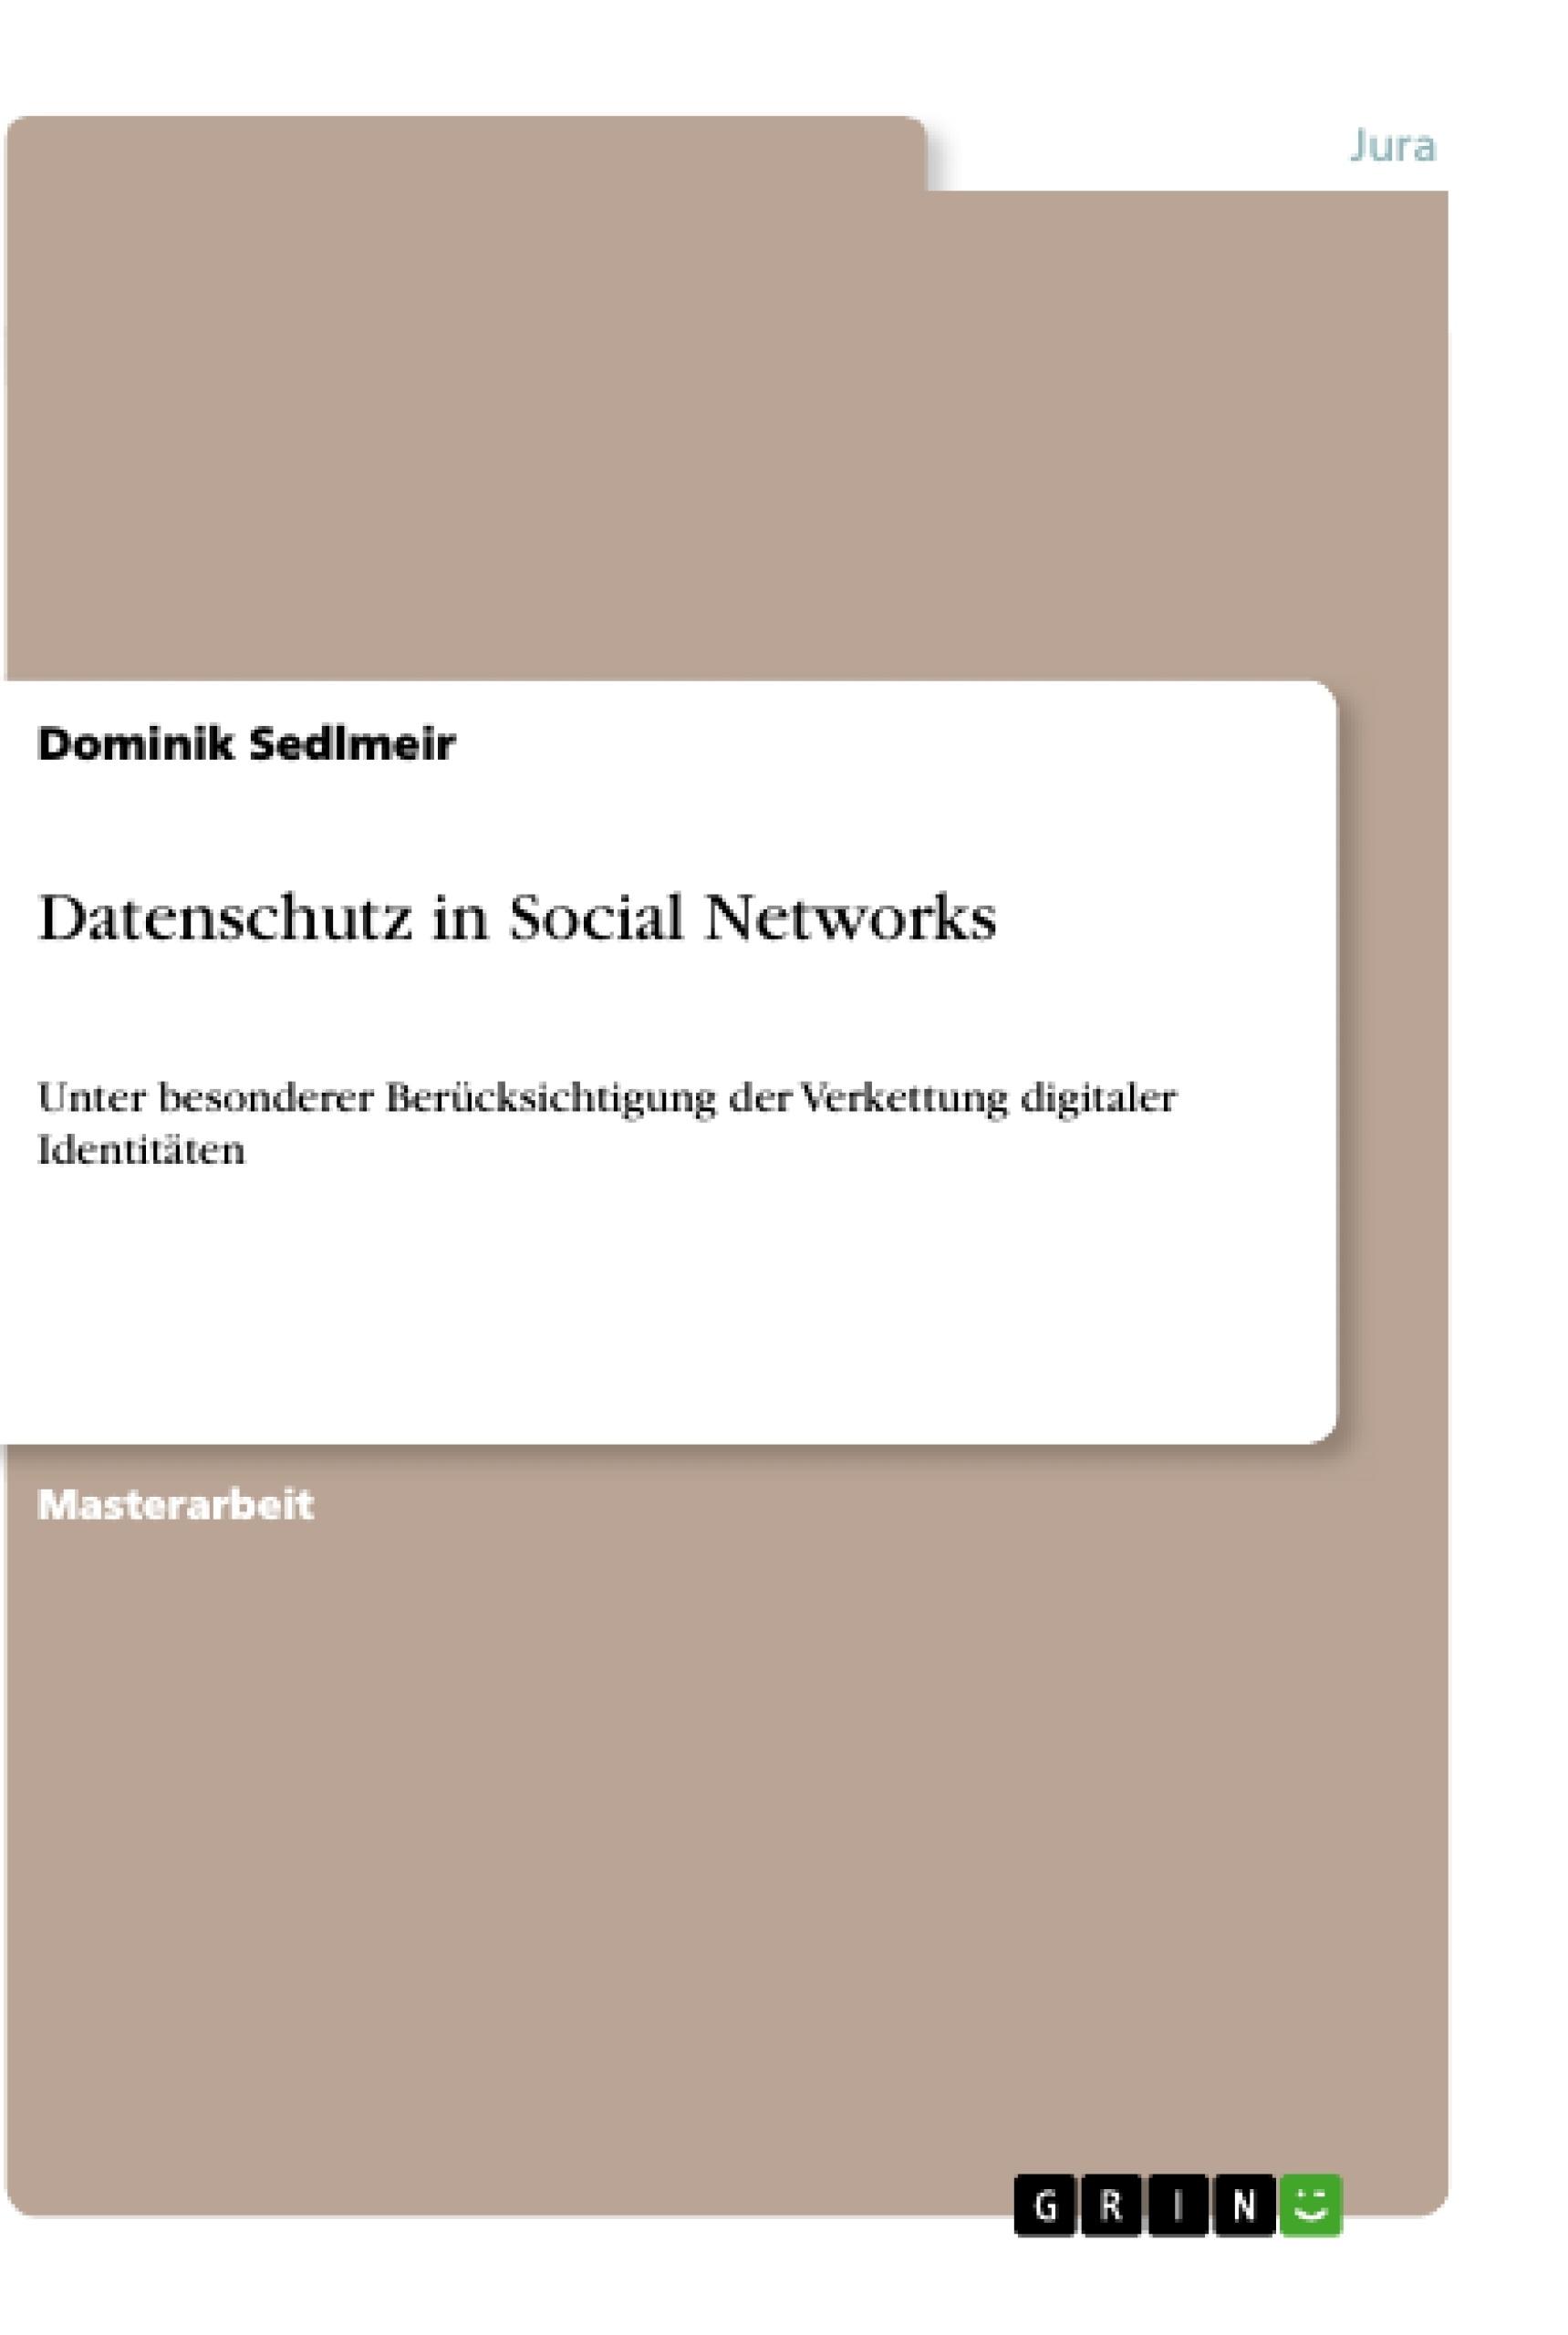 Titel: Datenschutz in Social Networks